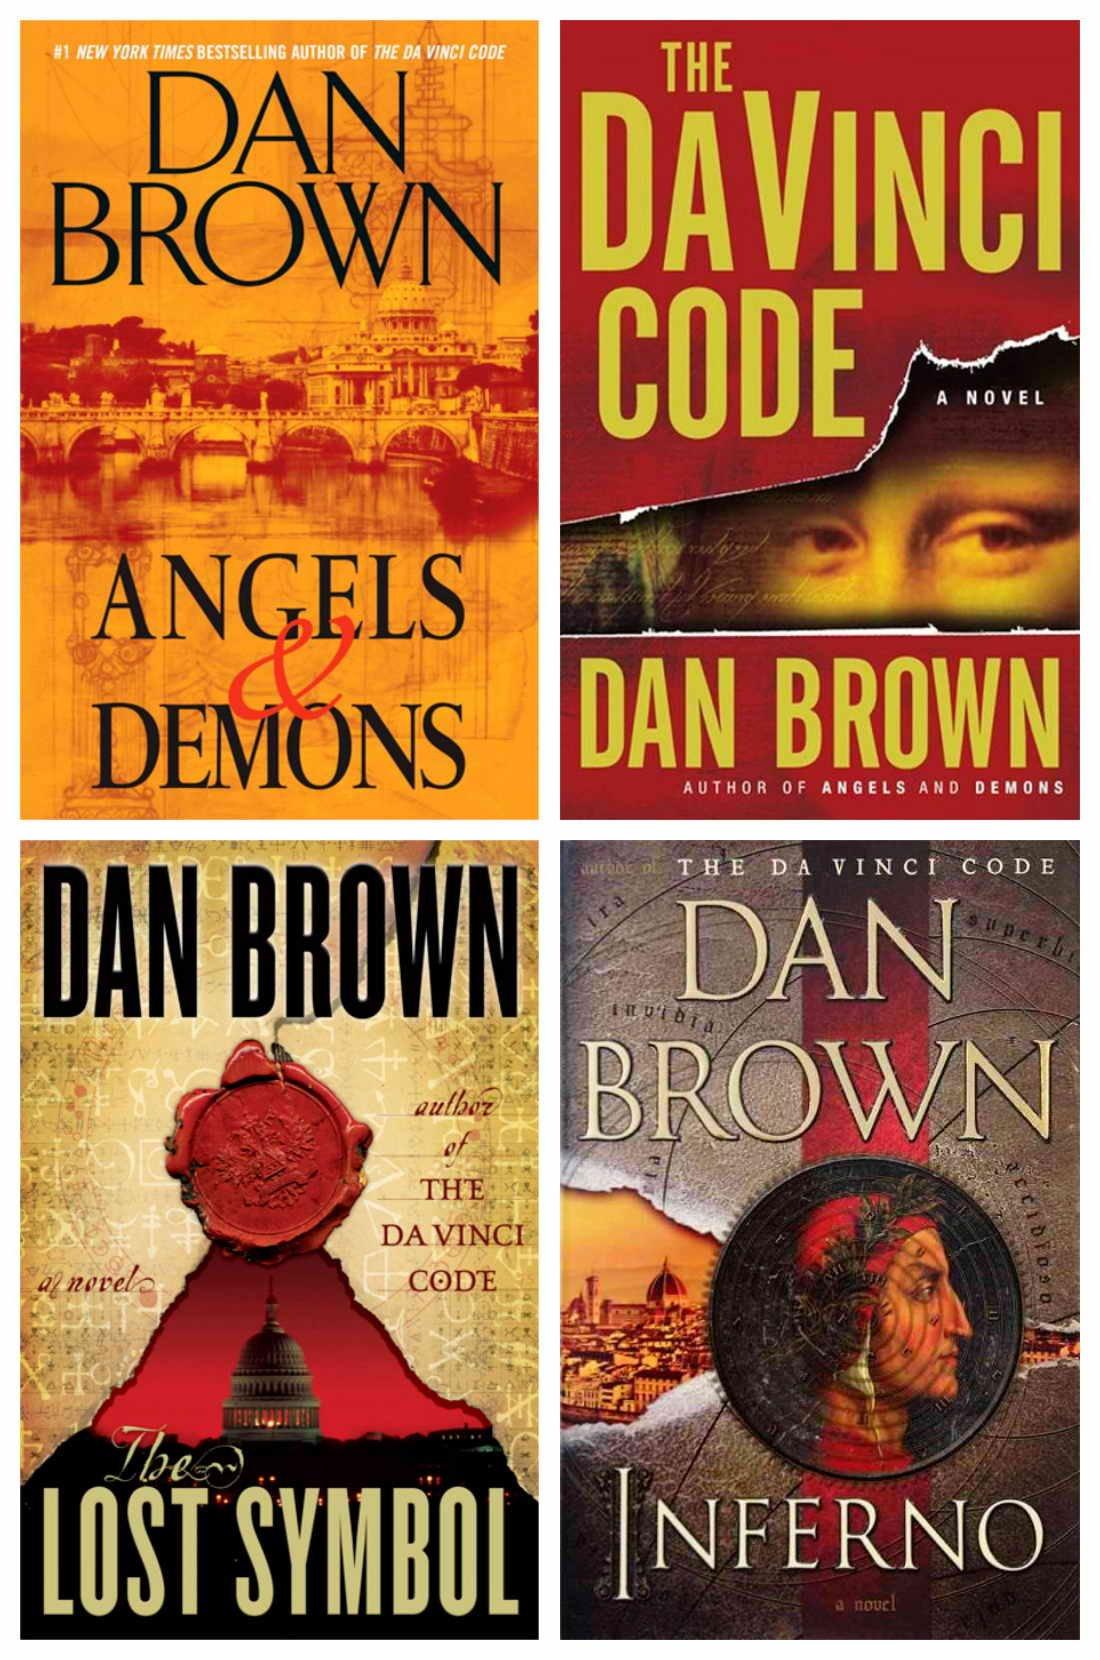 Amazon.com: Dan Brown's Robert Langdon Tetralogy Hardcover Set: Angel's &  Demons / The Da Vinci Code / The Lost Symbol / Inferno (0719534866227): Dan  Brown: Books